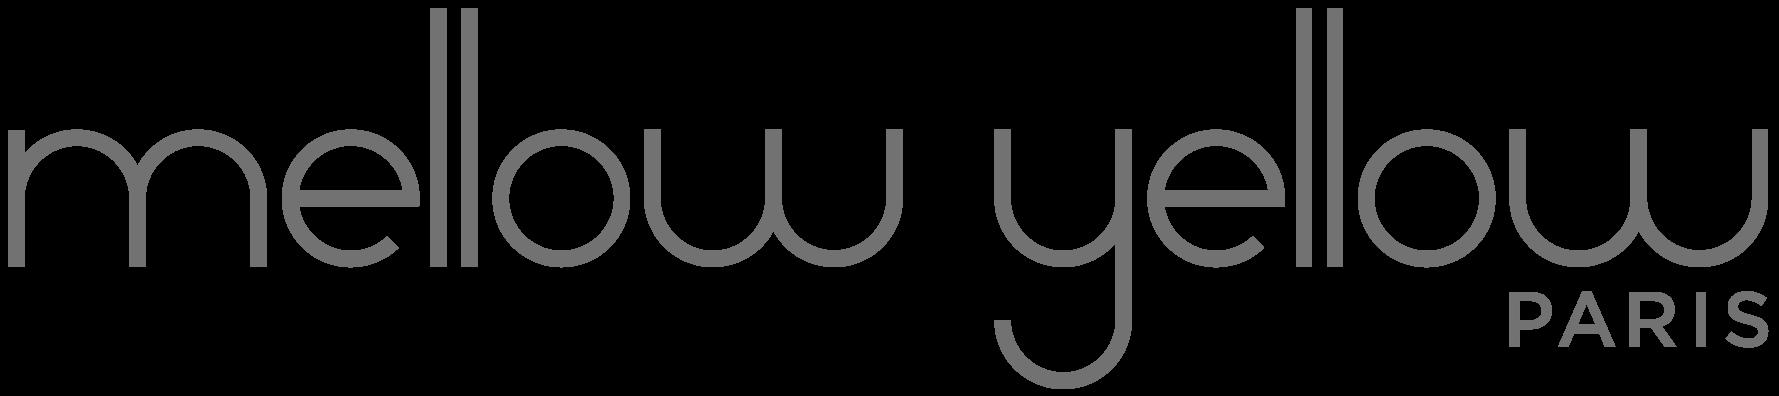 logo_mellow yellow